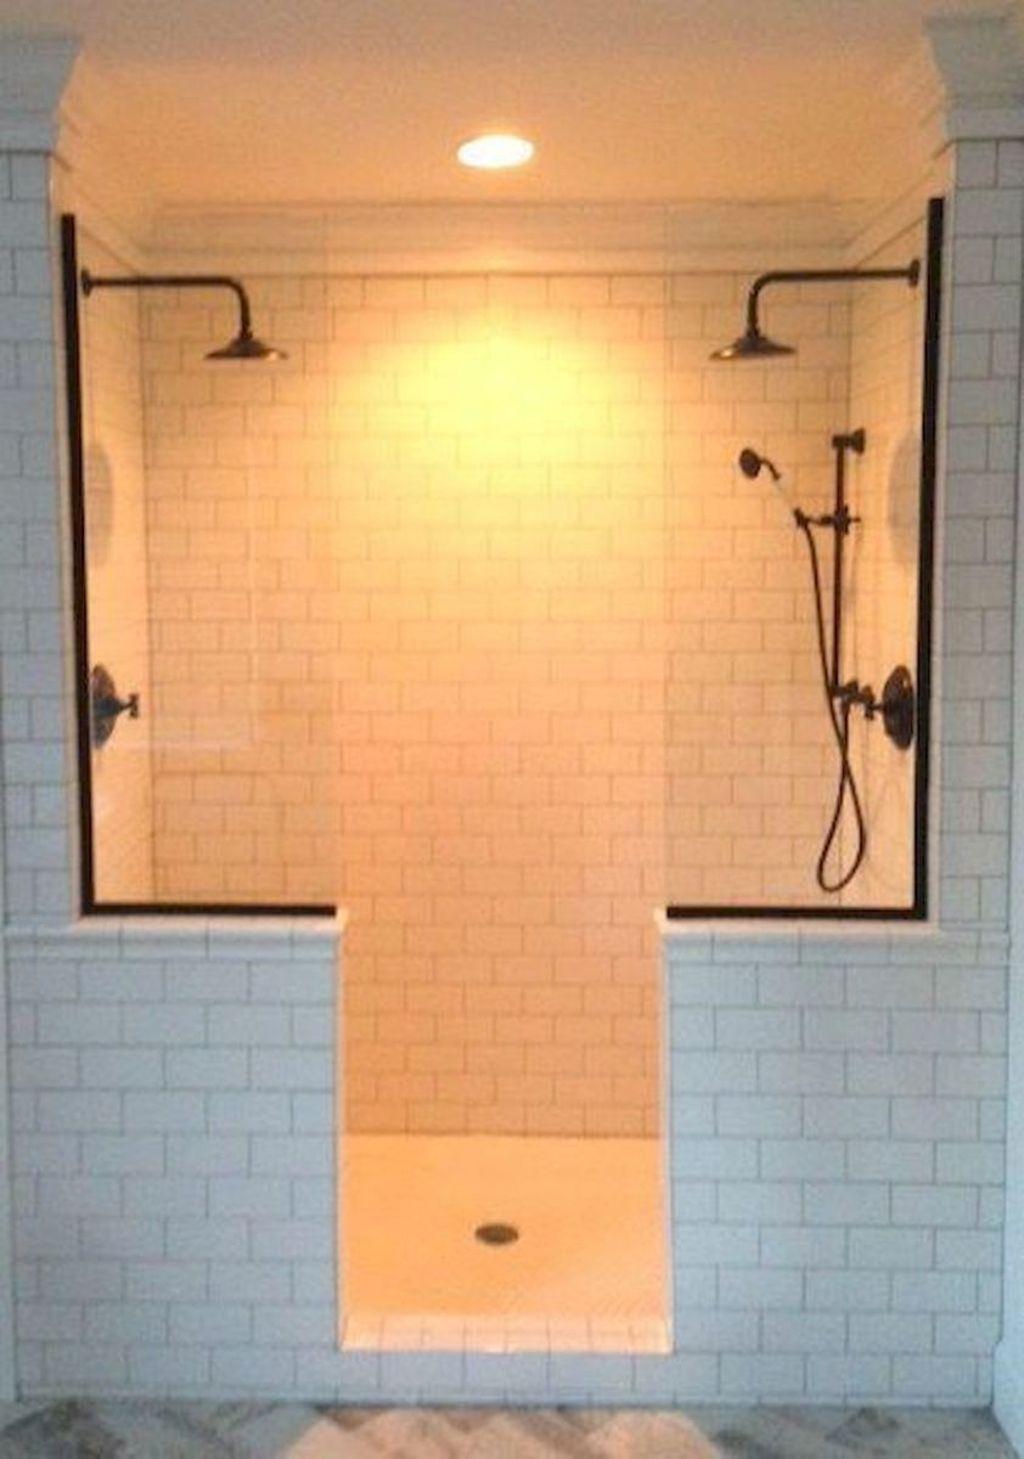 Astonishing Farmhouse Shower Tile Decor Ideas To Try 03